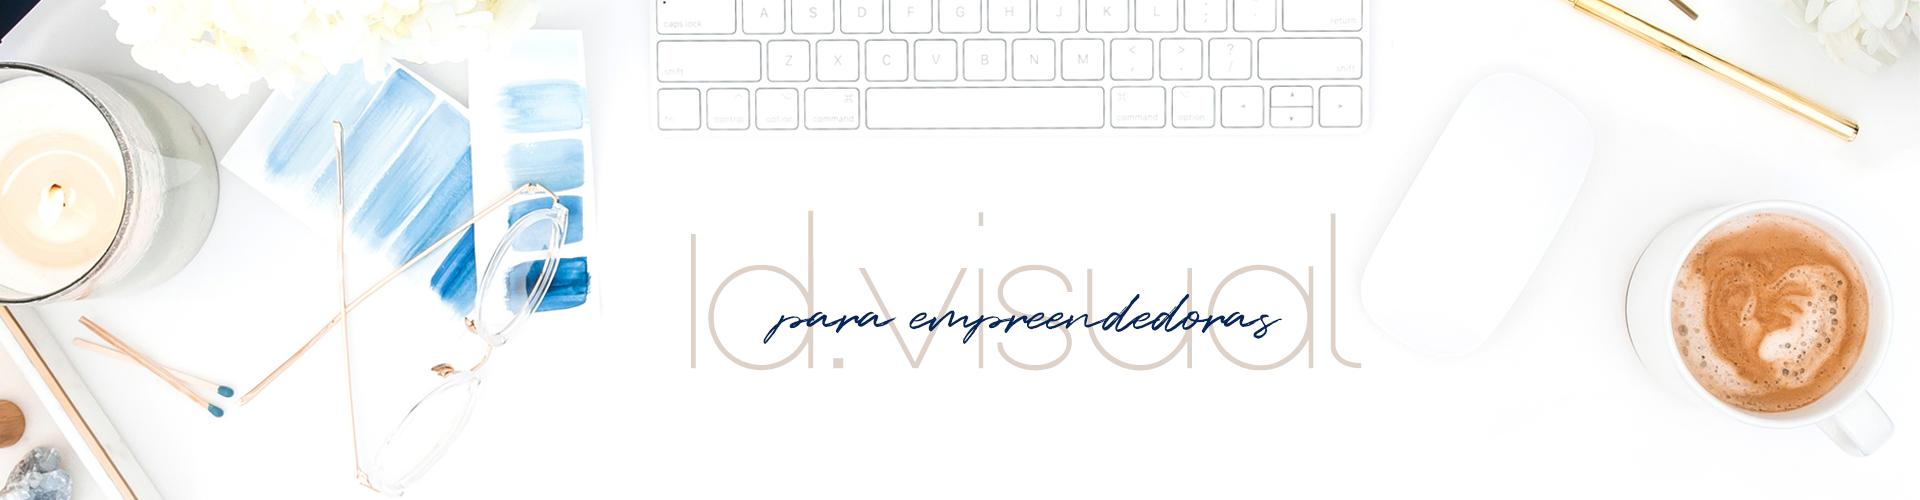 Identidade Visual para empreendedoras